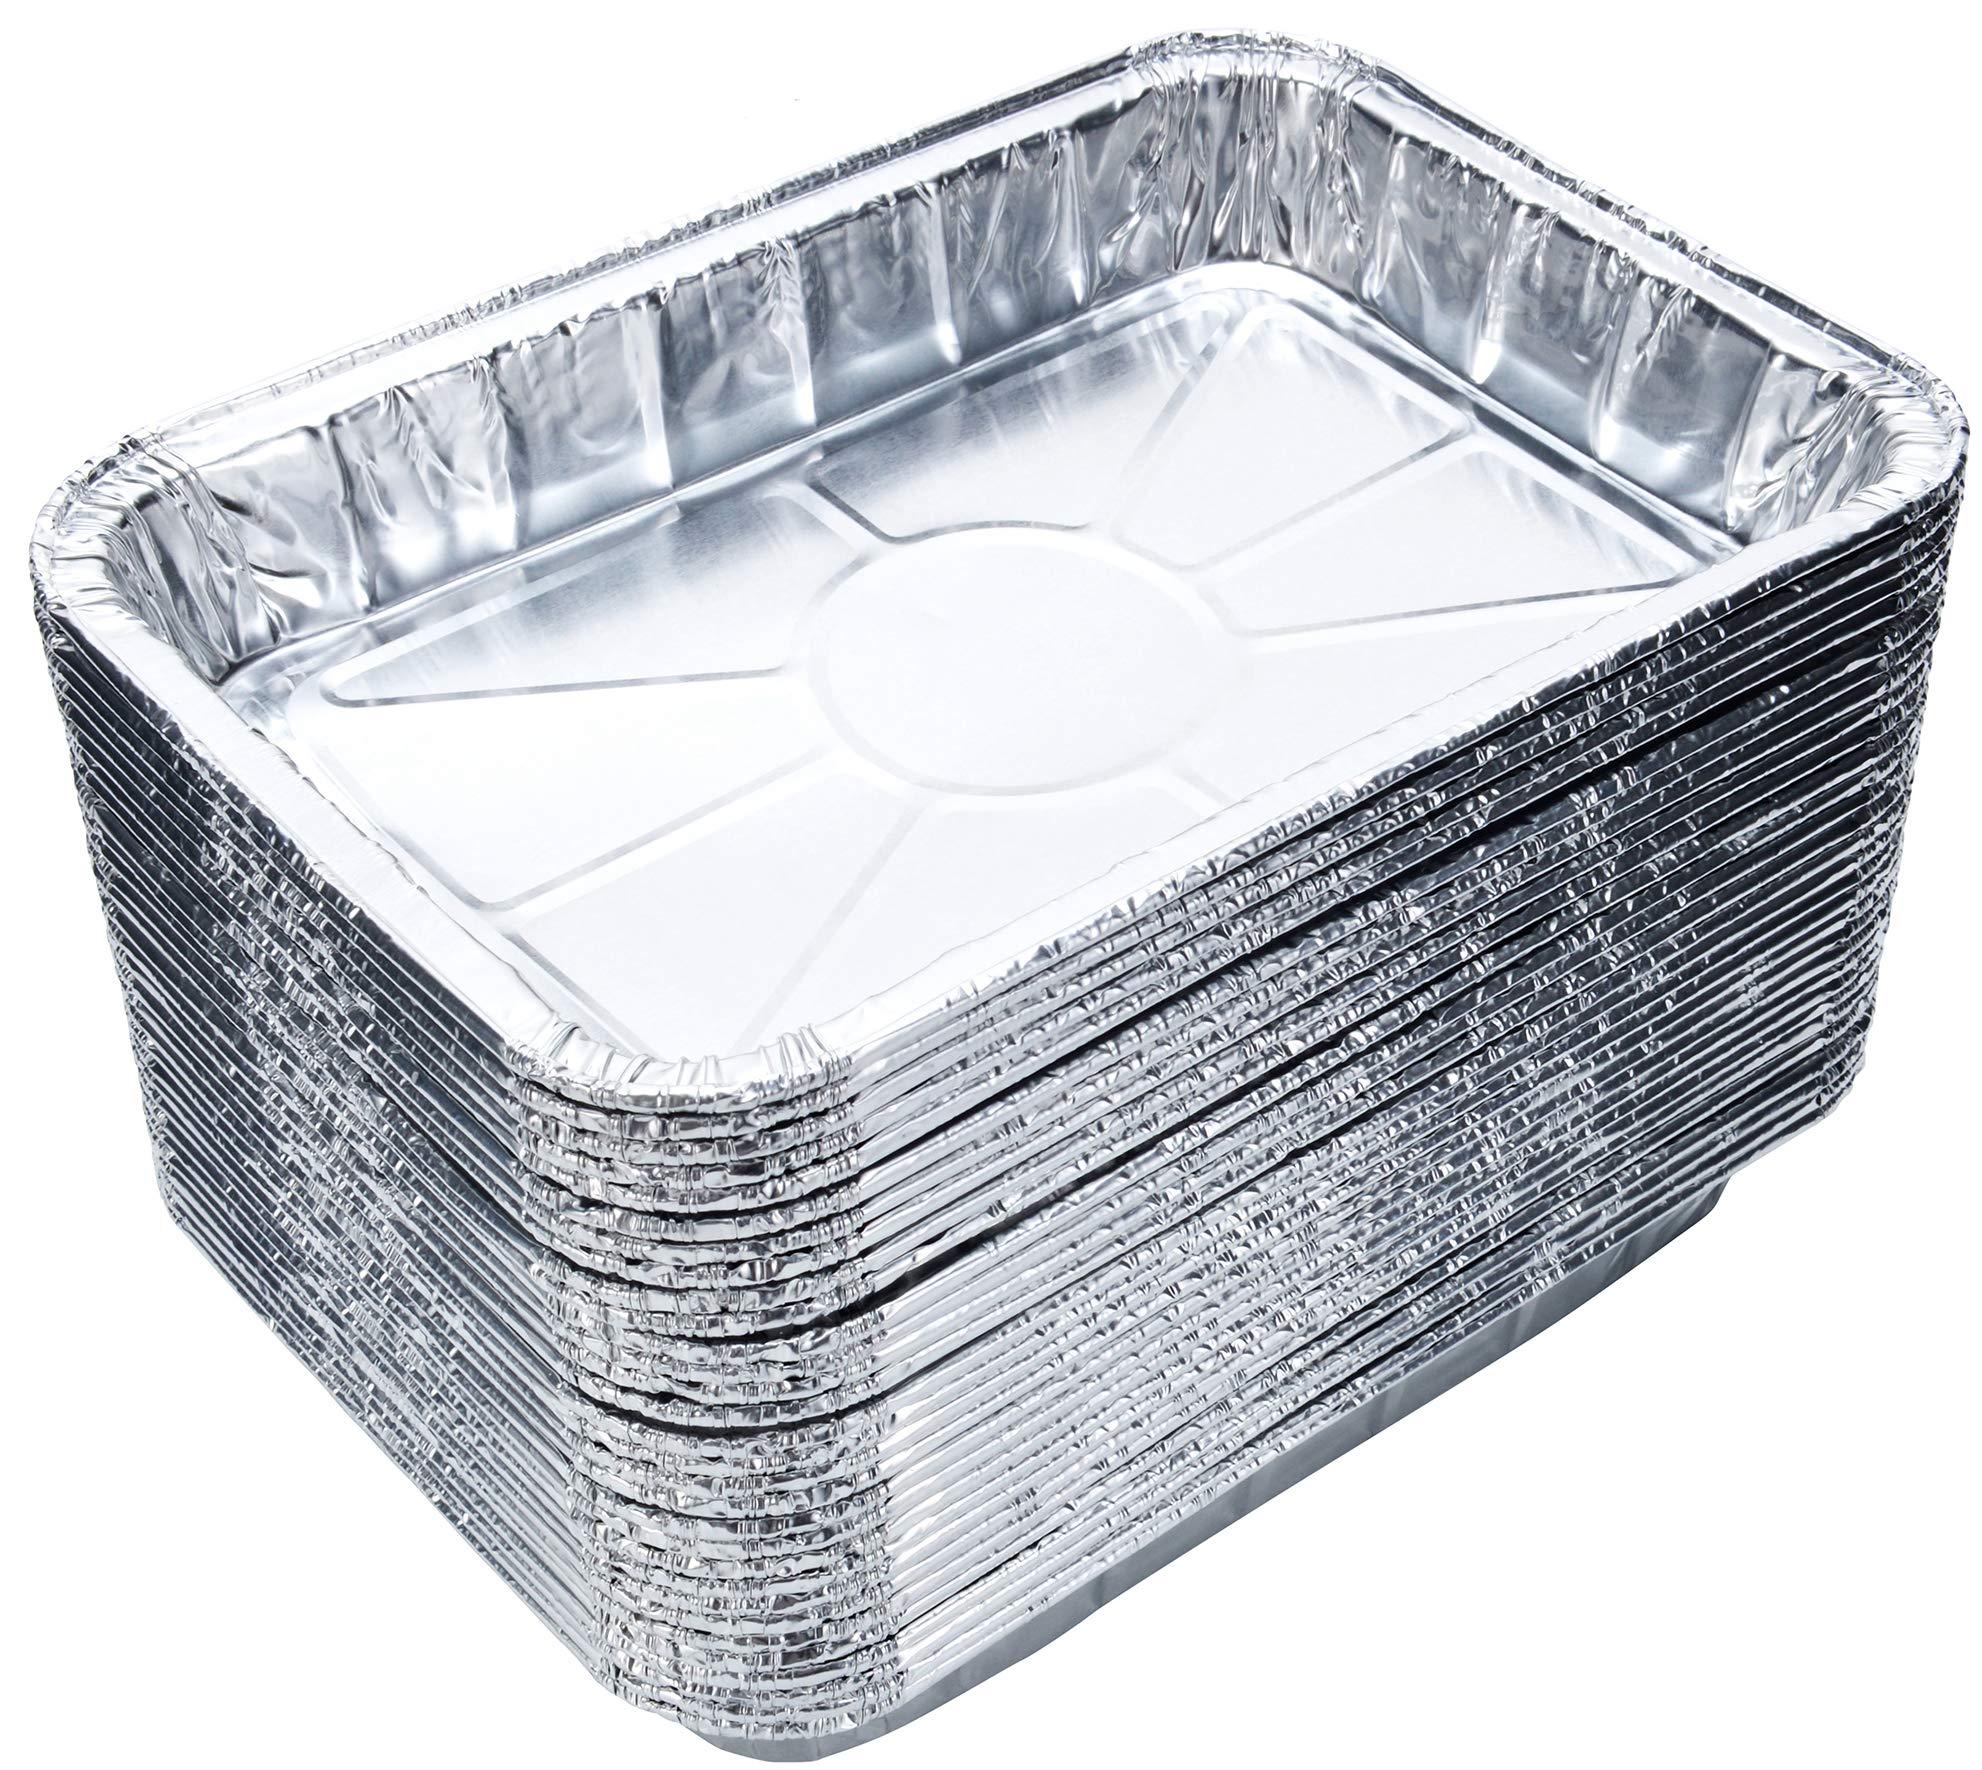 DOBI (30-Pack) Weber Grills Compatible Drip Pans, Bulk Package, Aluminum Foil BBQ Grease Pans, 7.5'' x 5'' by DOBI